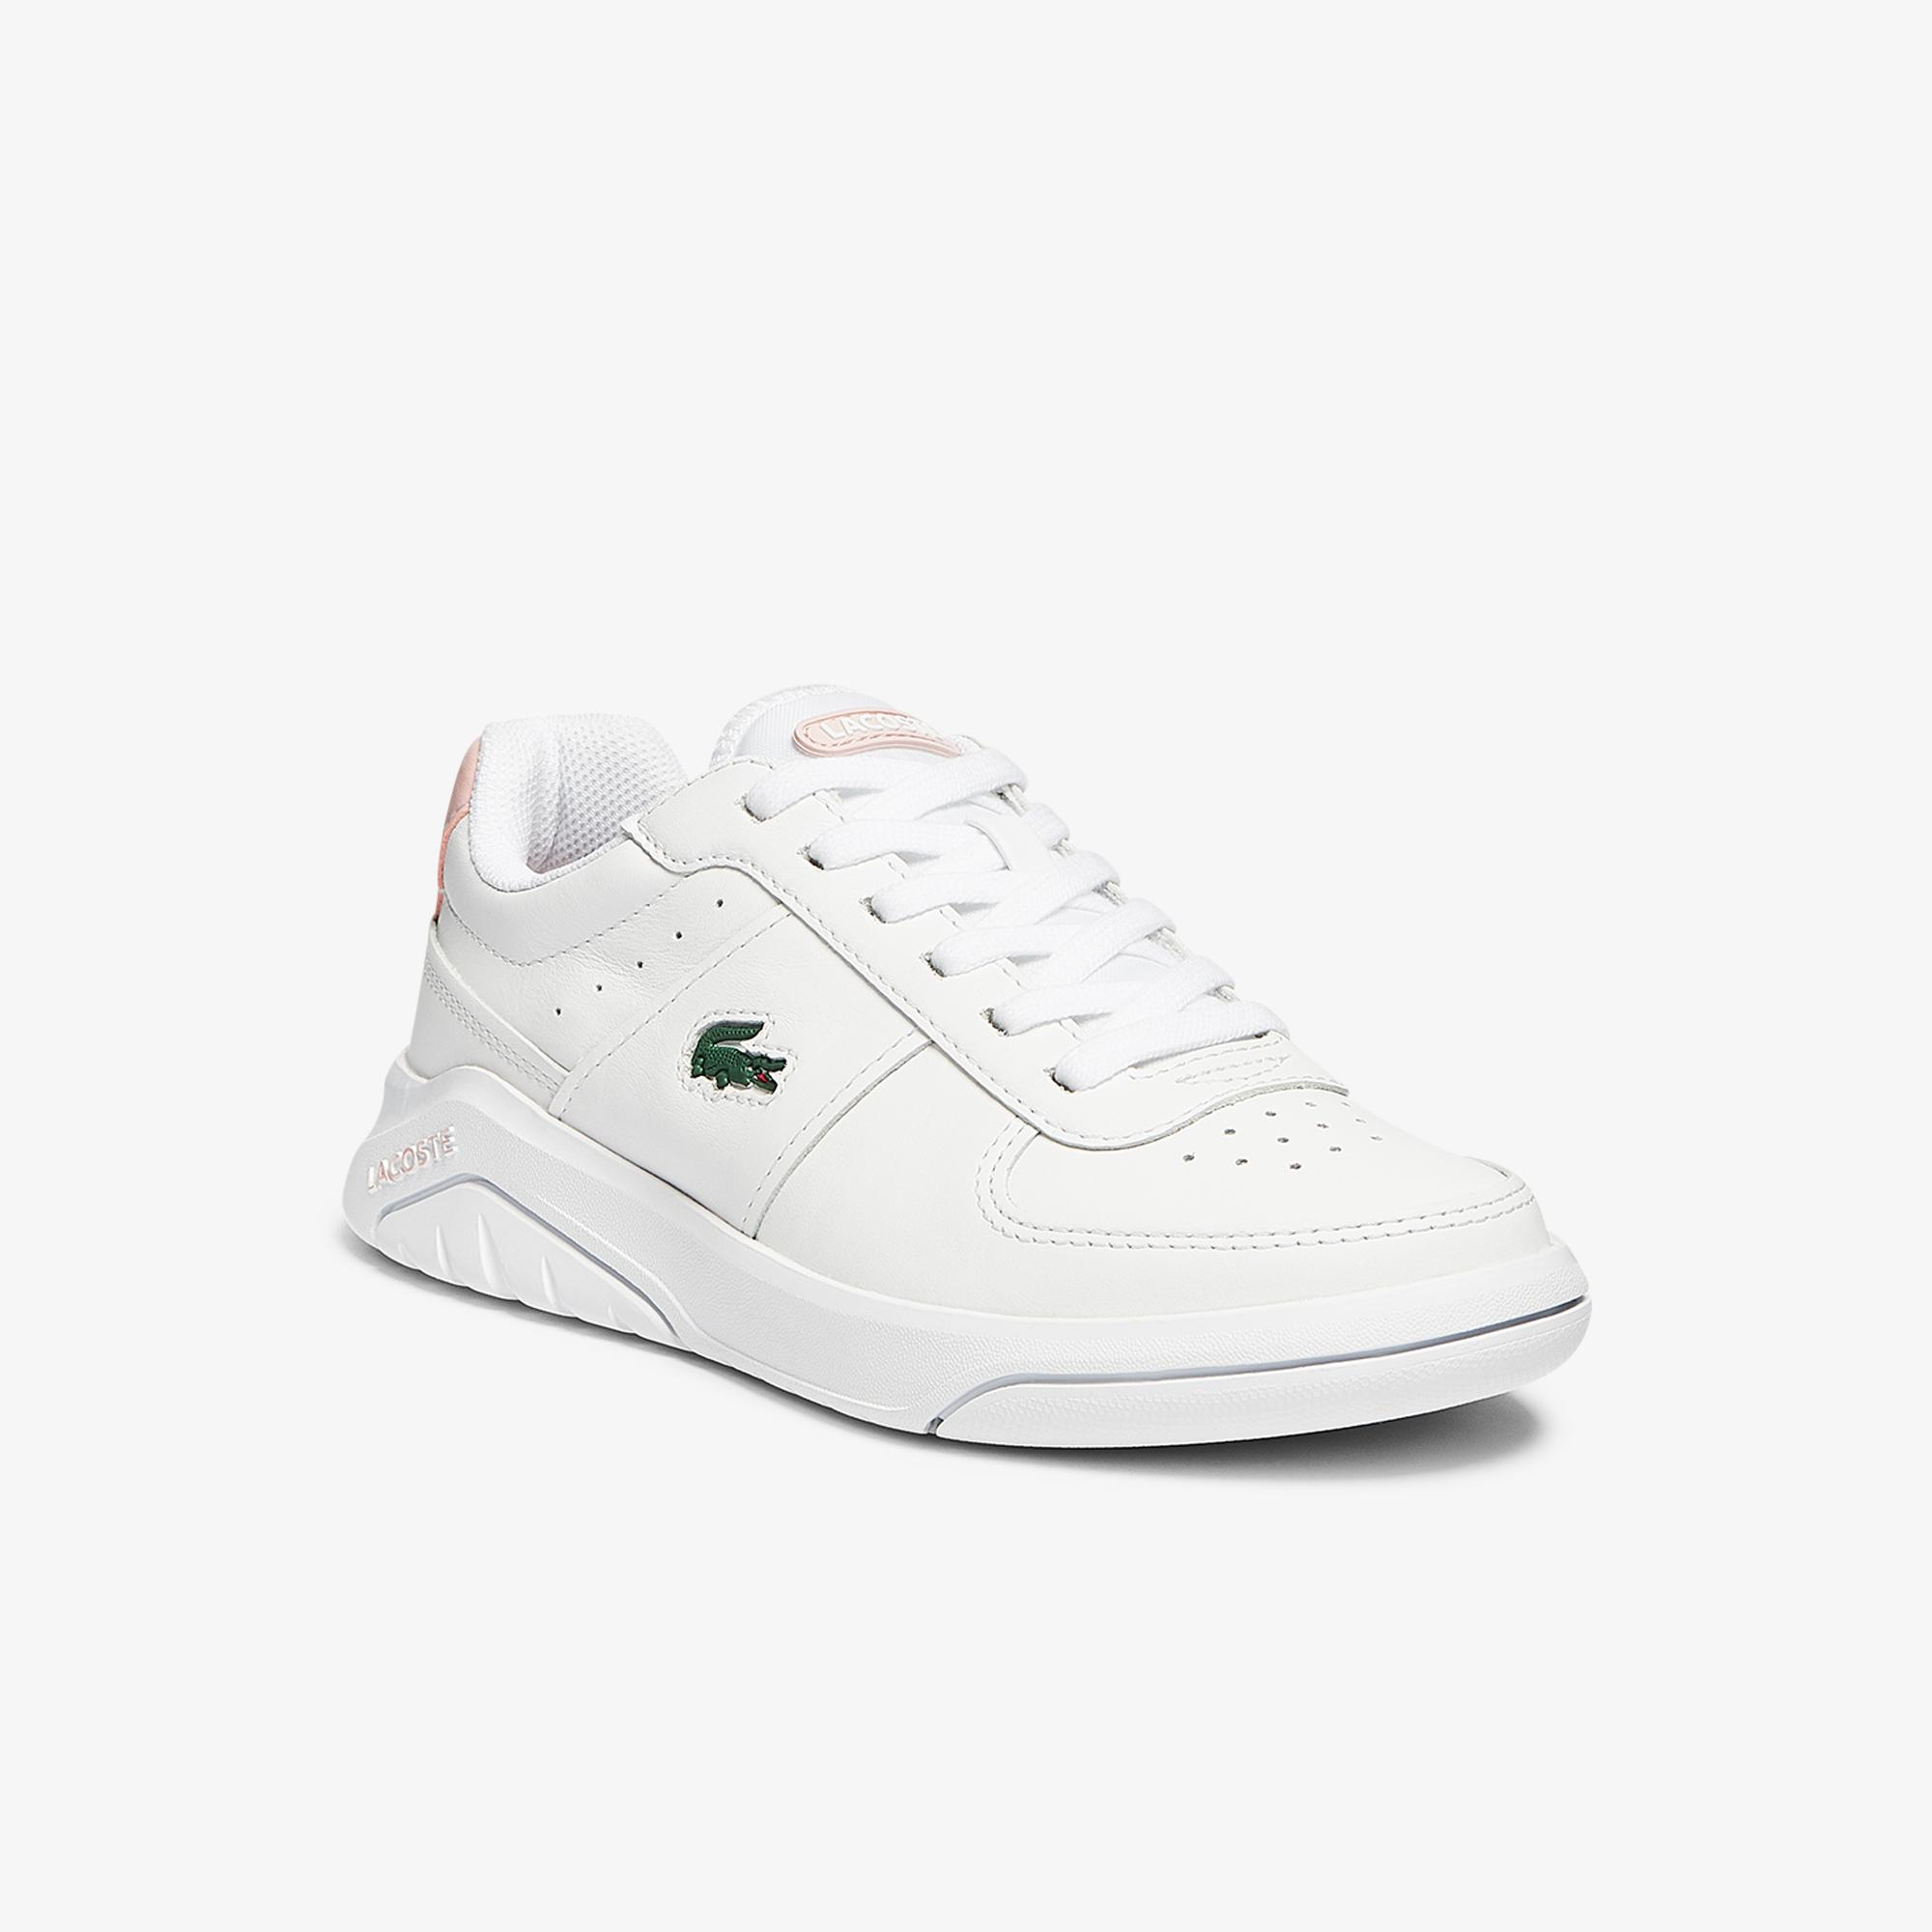 Lacoste Women's Game Advance 0721 2 Sfa Shoes